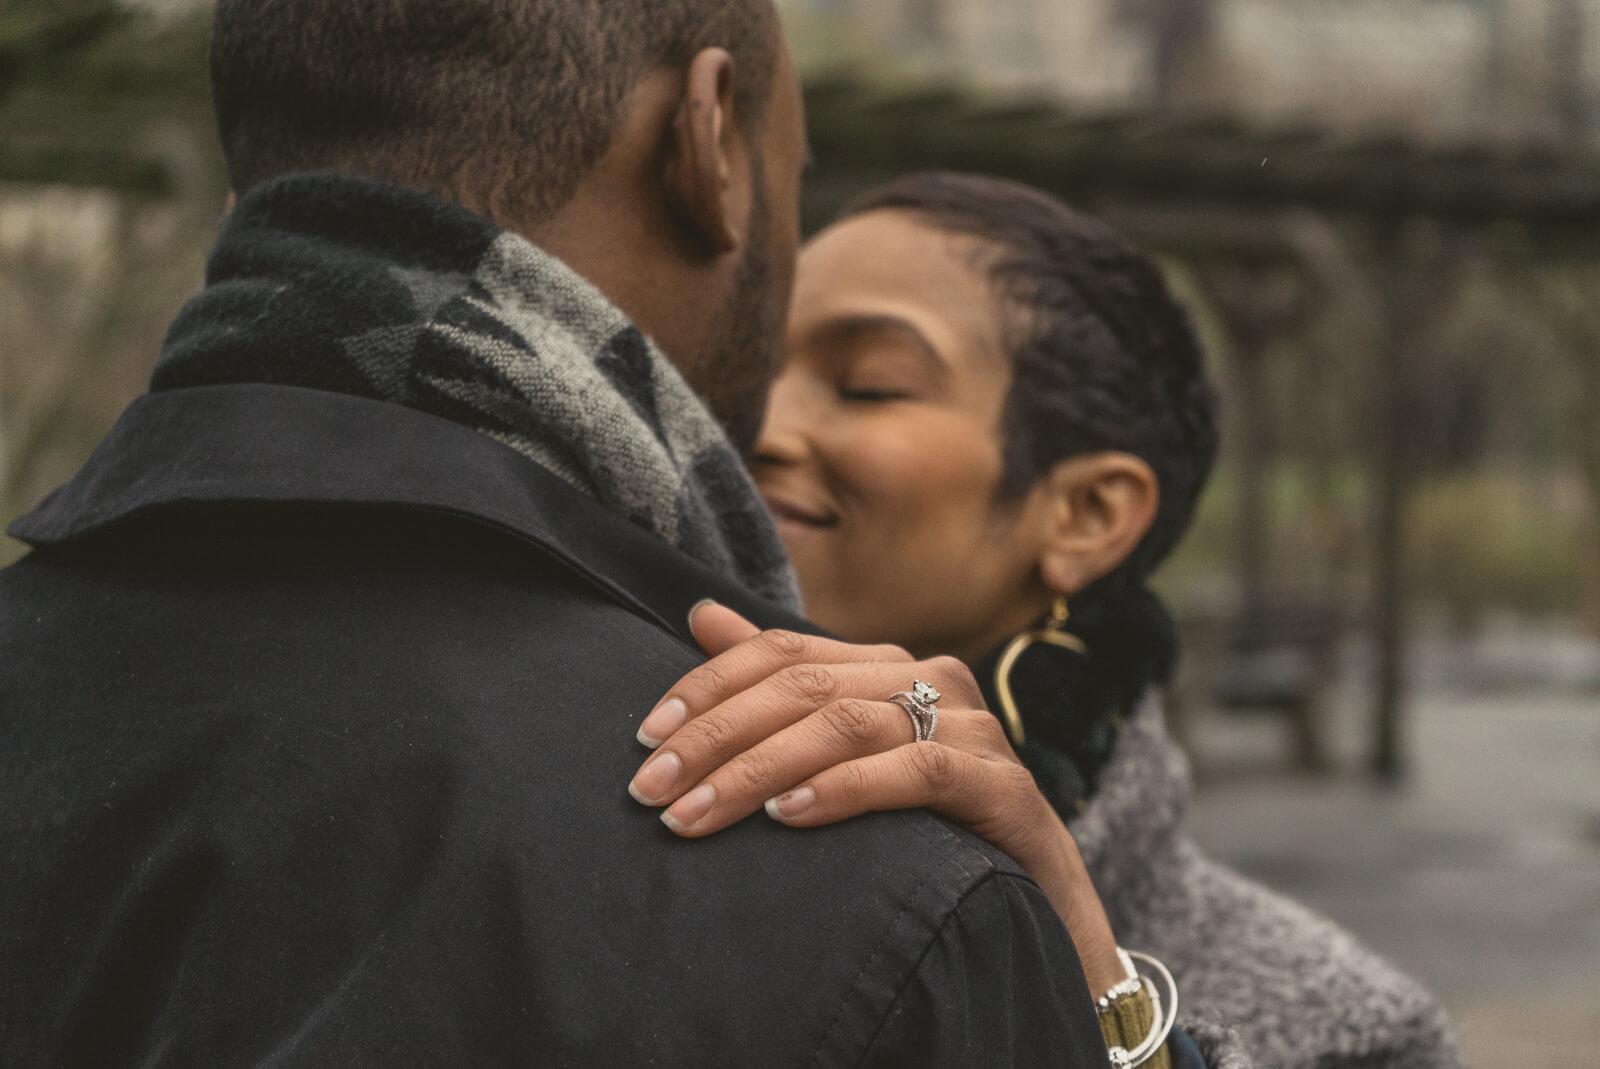 Photo Pine Bank bridge Central Park Marriage Proposal   VladLeto